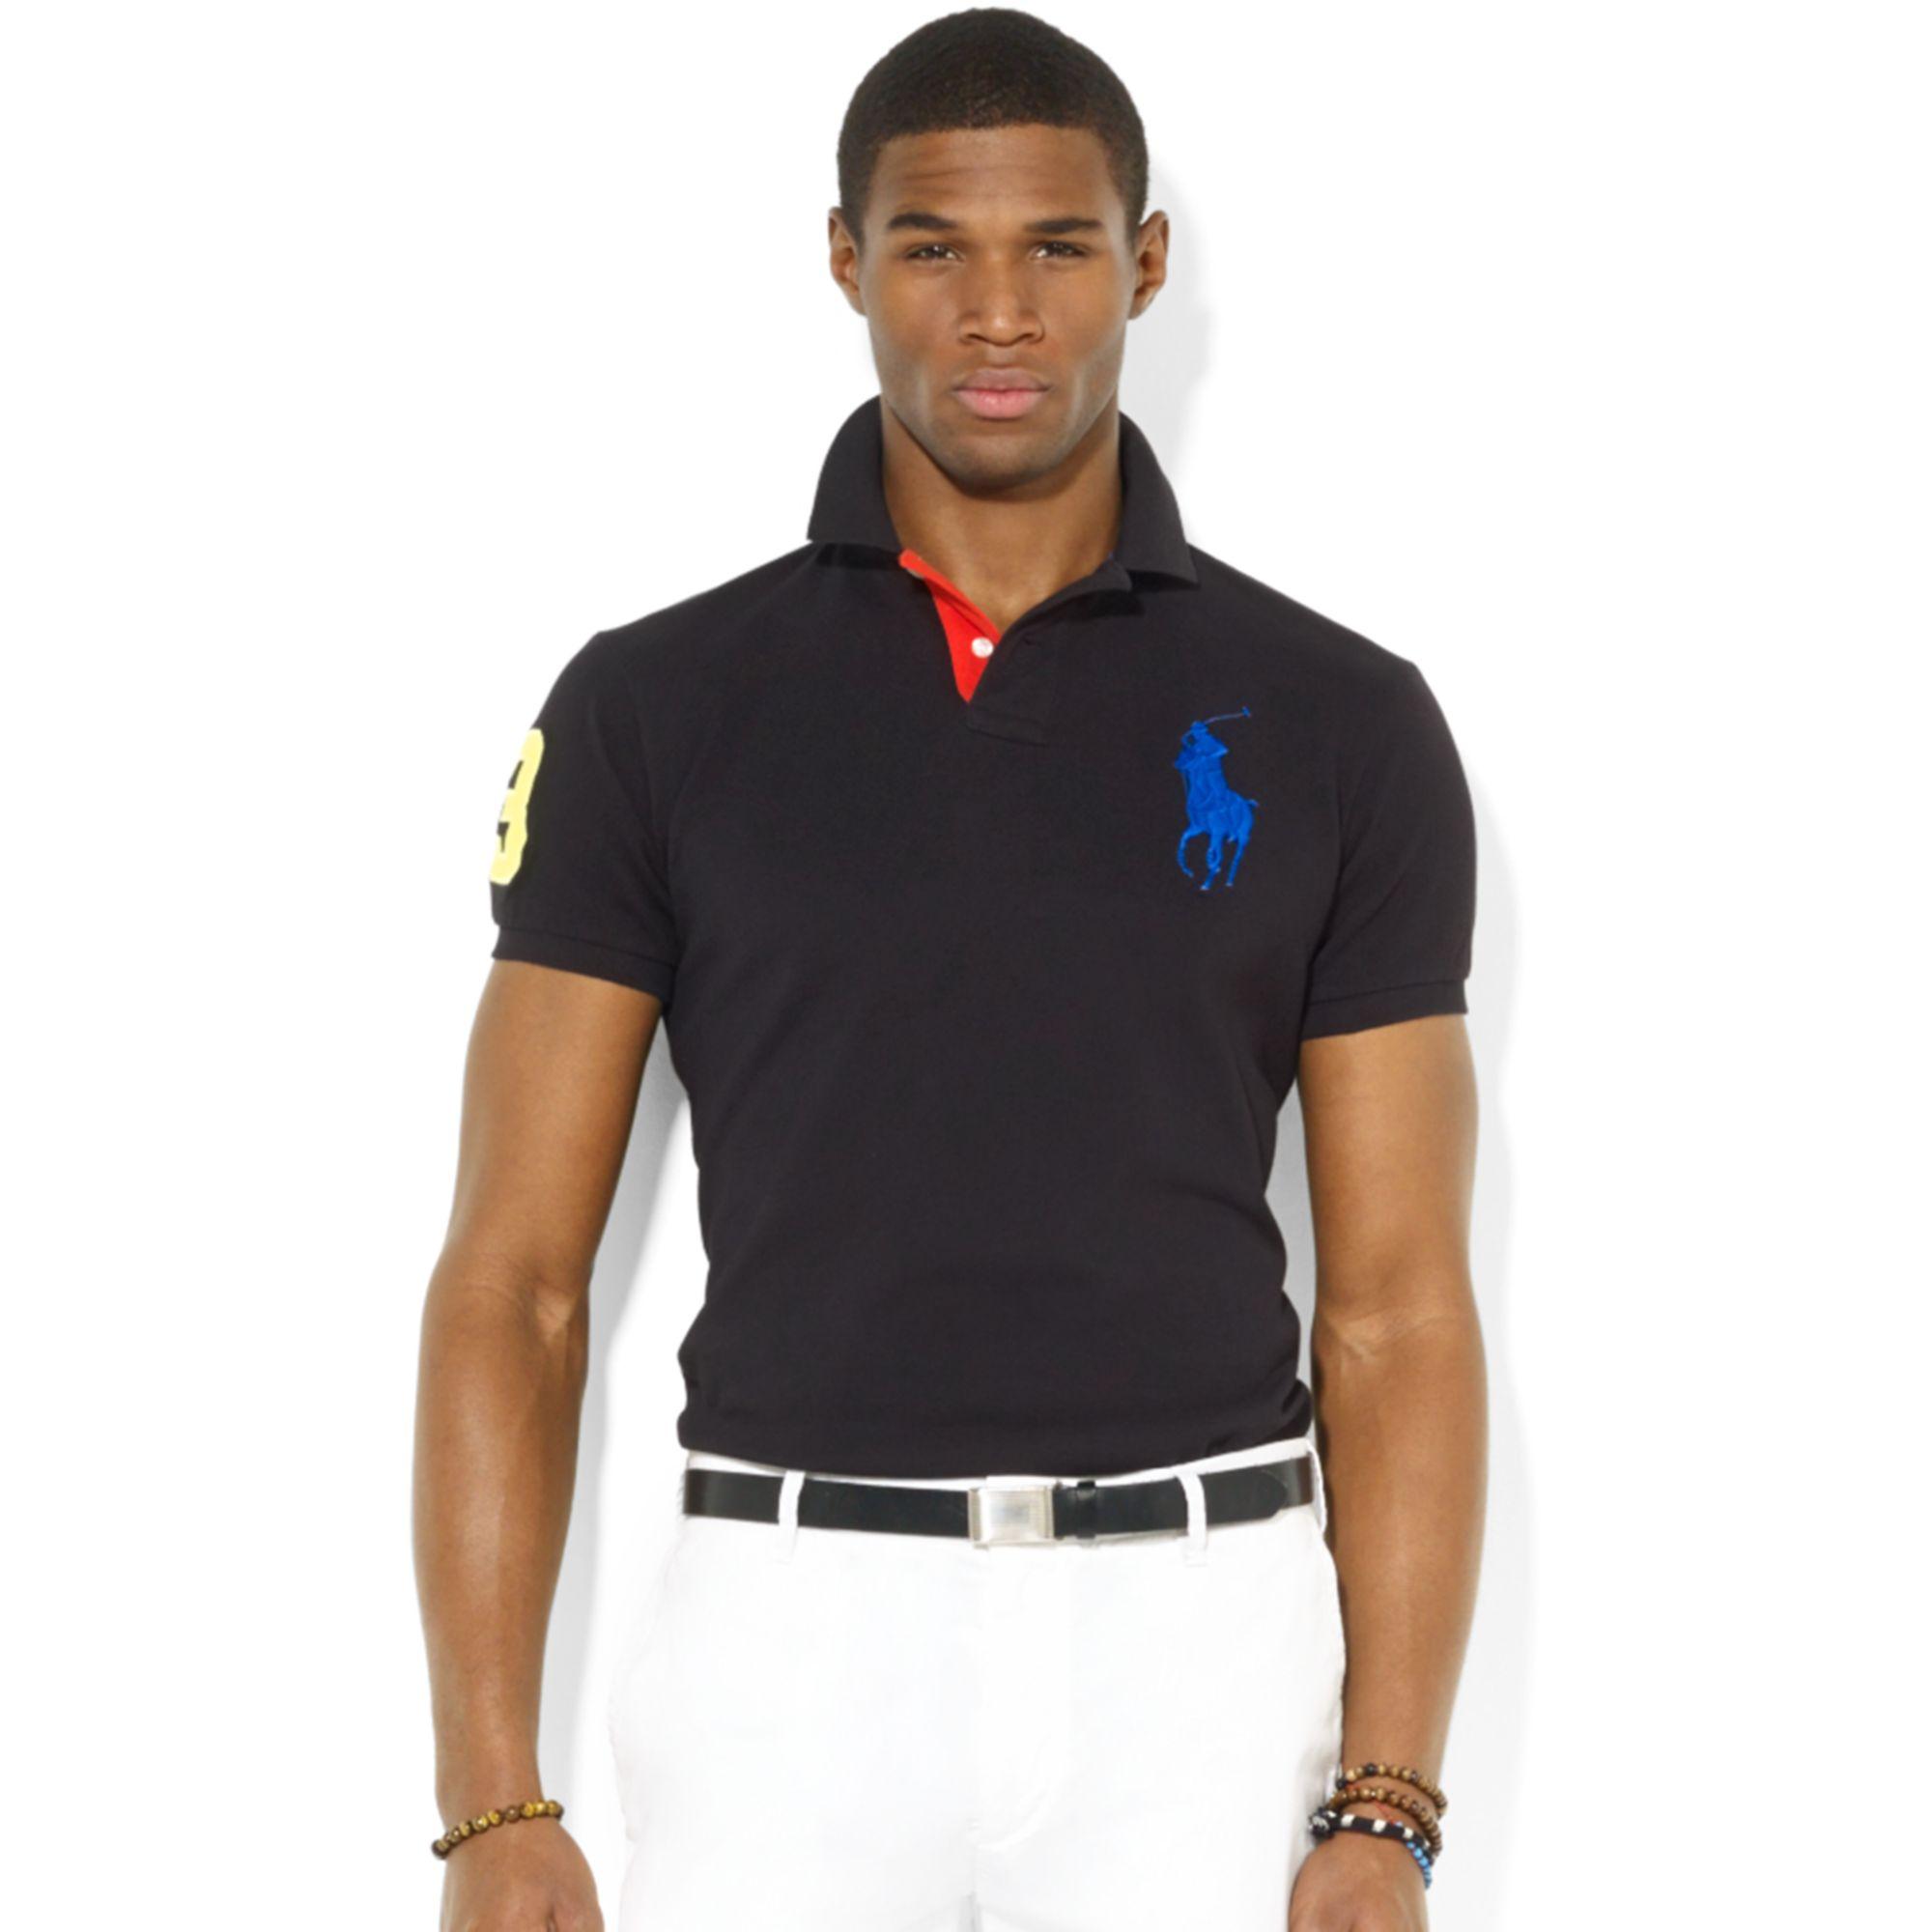 Polo ralph lauren men custom fit big pony polo shirt for Polo ralph lauren custom fit polo shirt